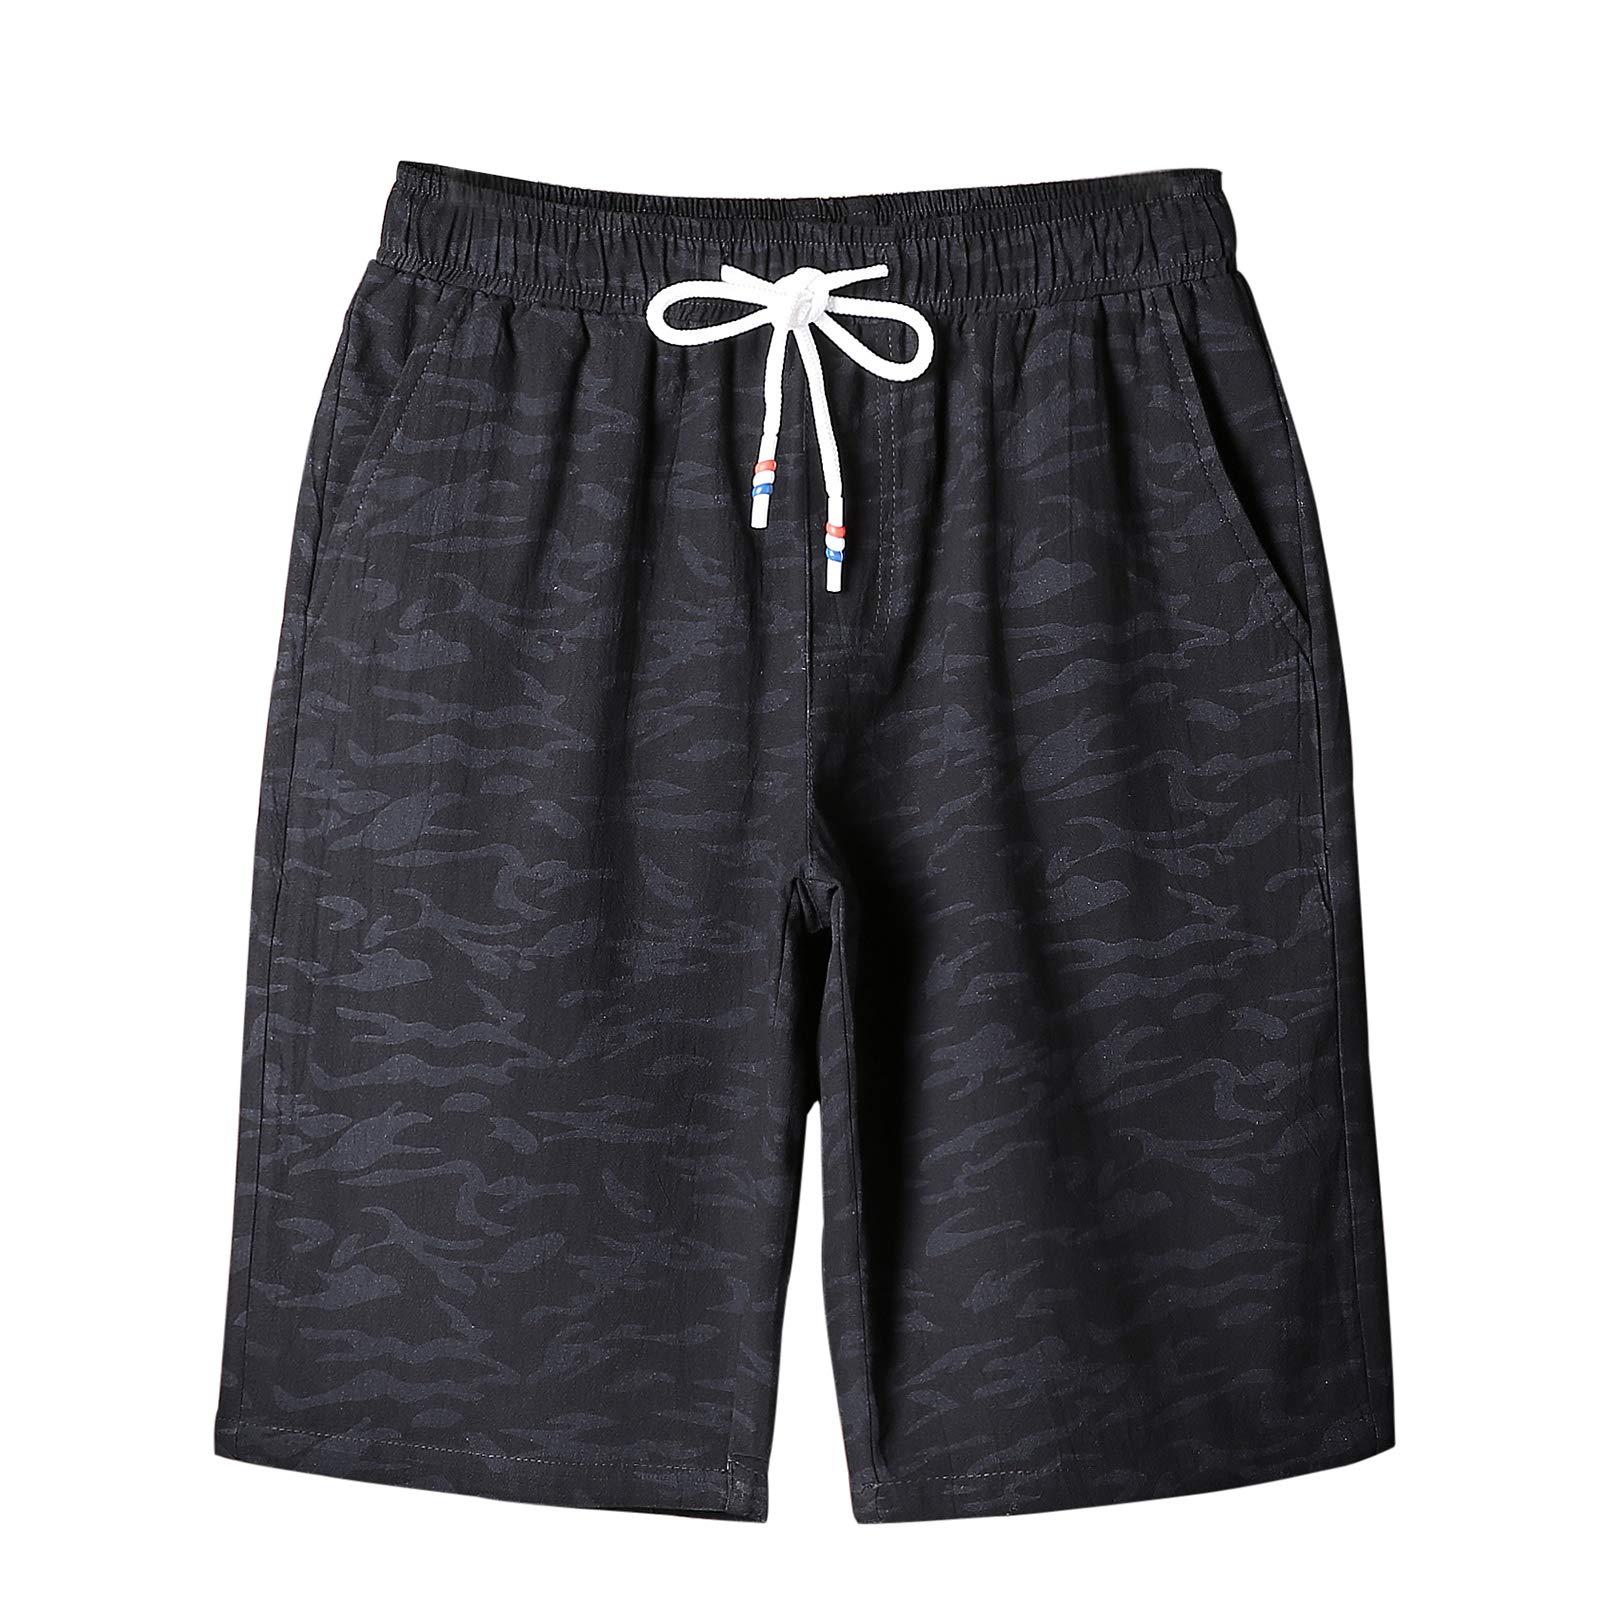 Rainbow Cloud 100% Cotton Fashion Camouflage Shorts for Men (US-XL, Black)